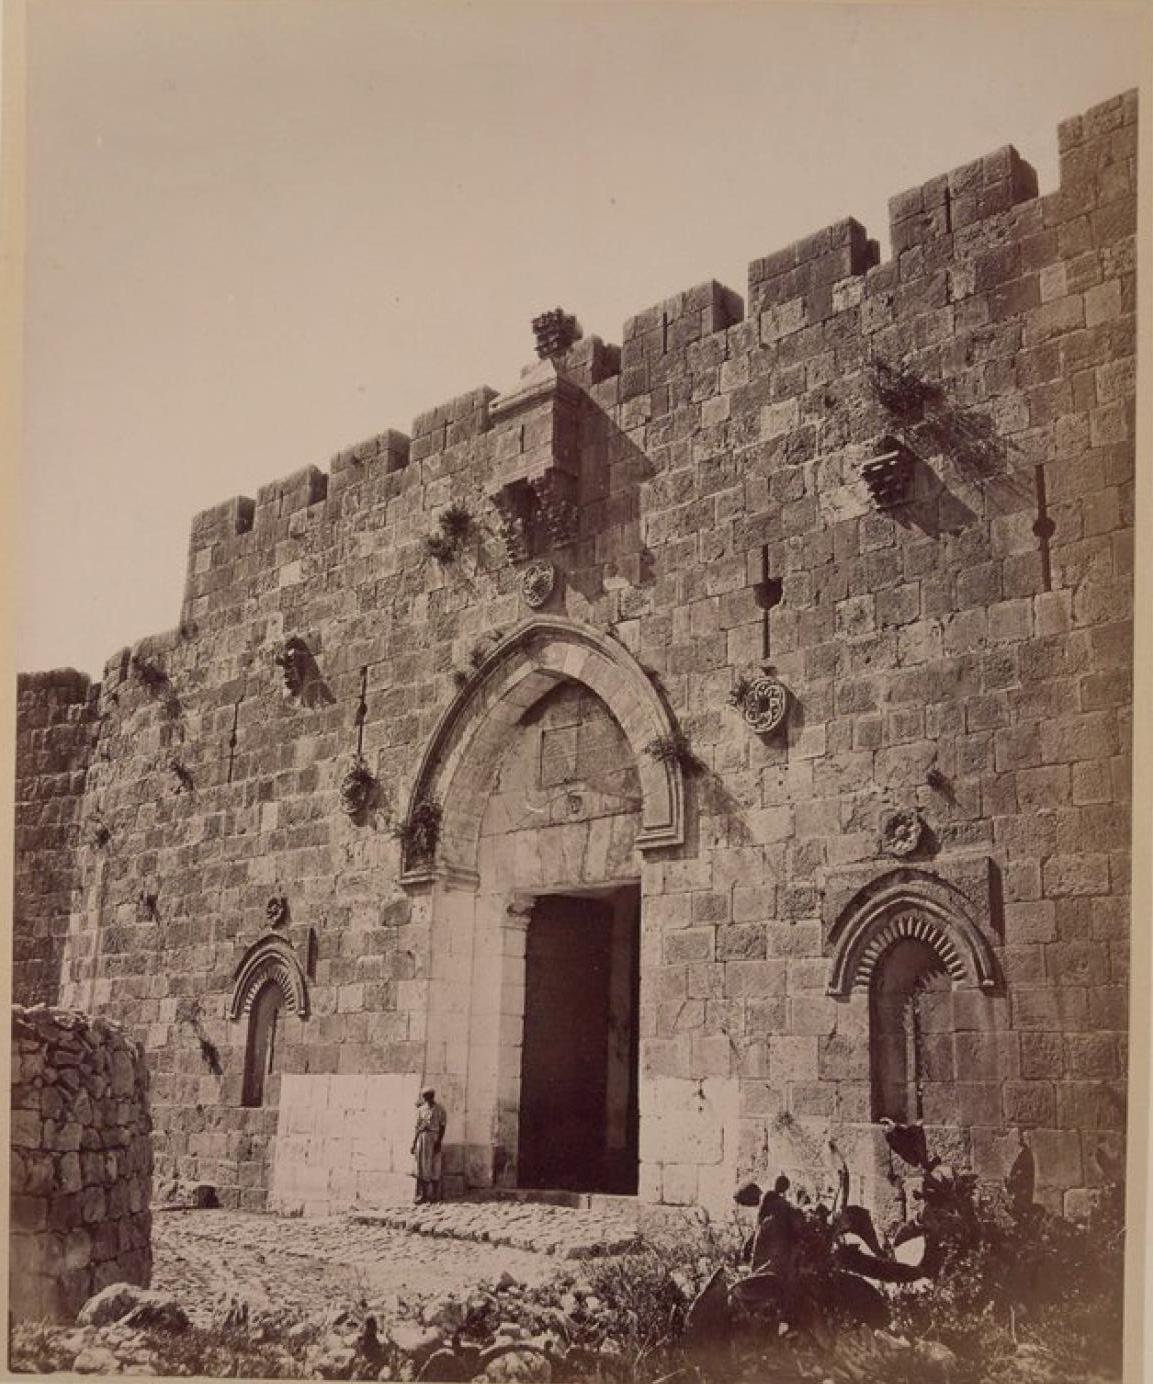 31. Иерусалим. «Ворота пророка Давида» (Сионские ворота)